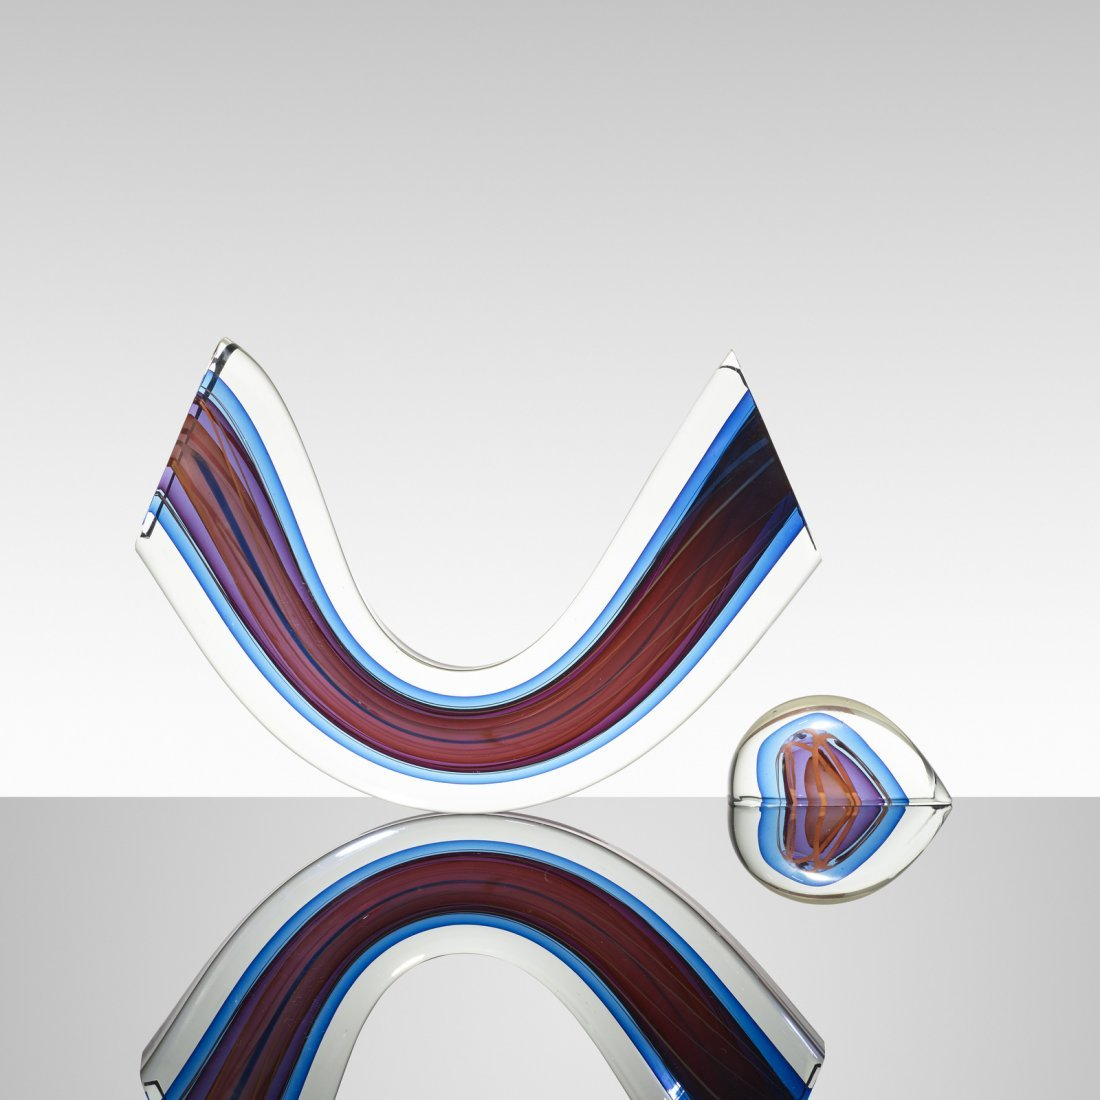 Harvey K. Littleton, Blue/Magenta Mobile Arc